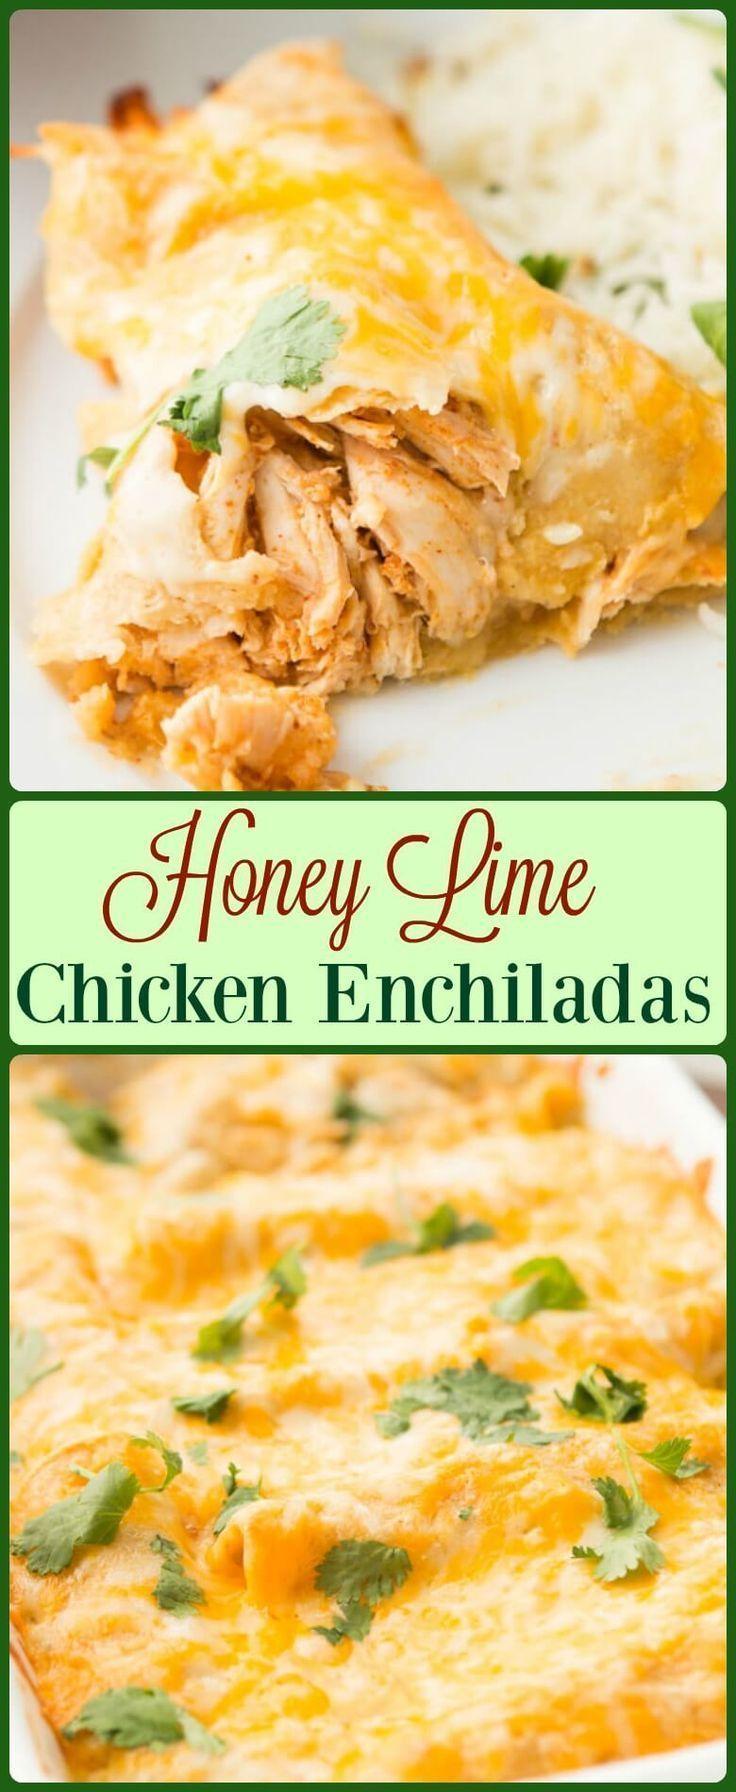 Honey Lime Chicken Enchiladas [+ Video] - Oh Sweet Basil